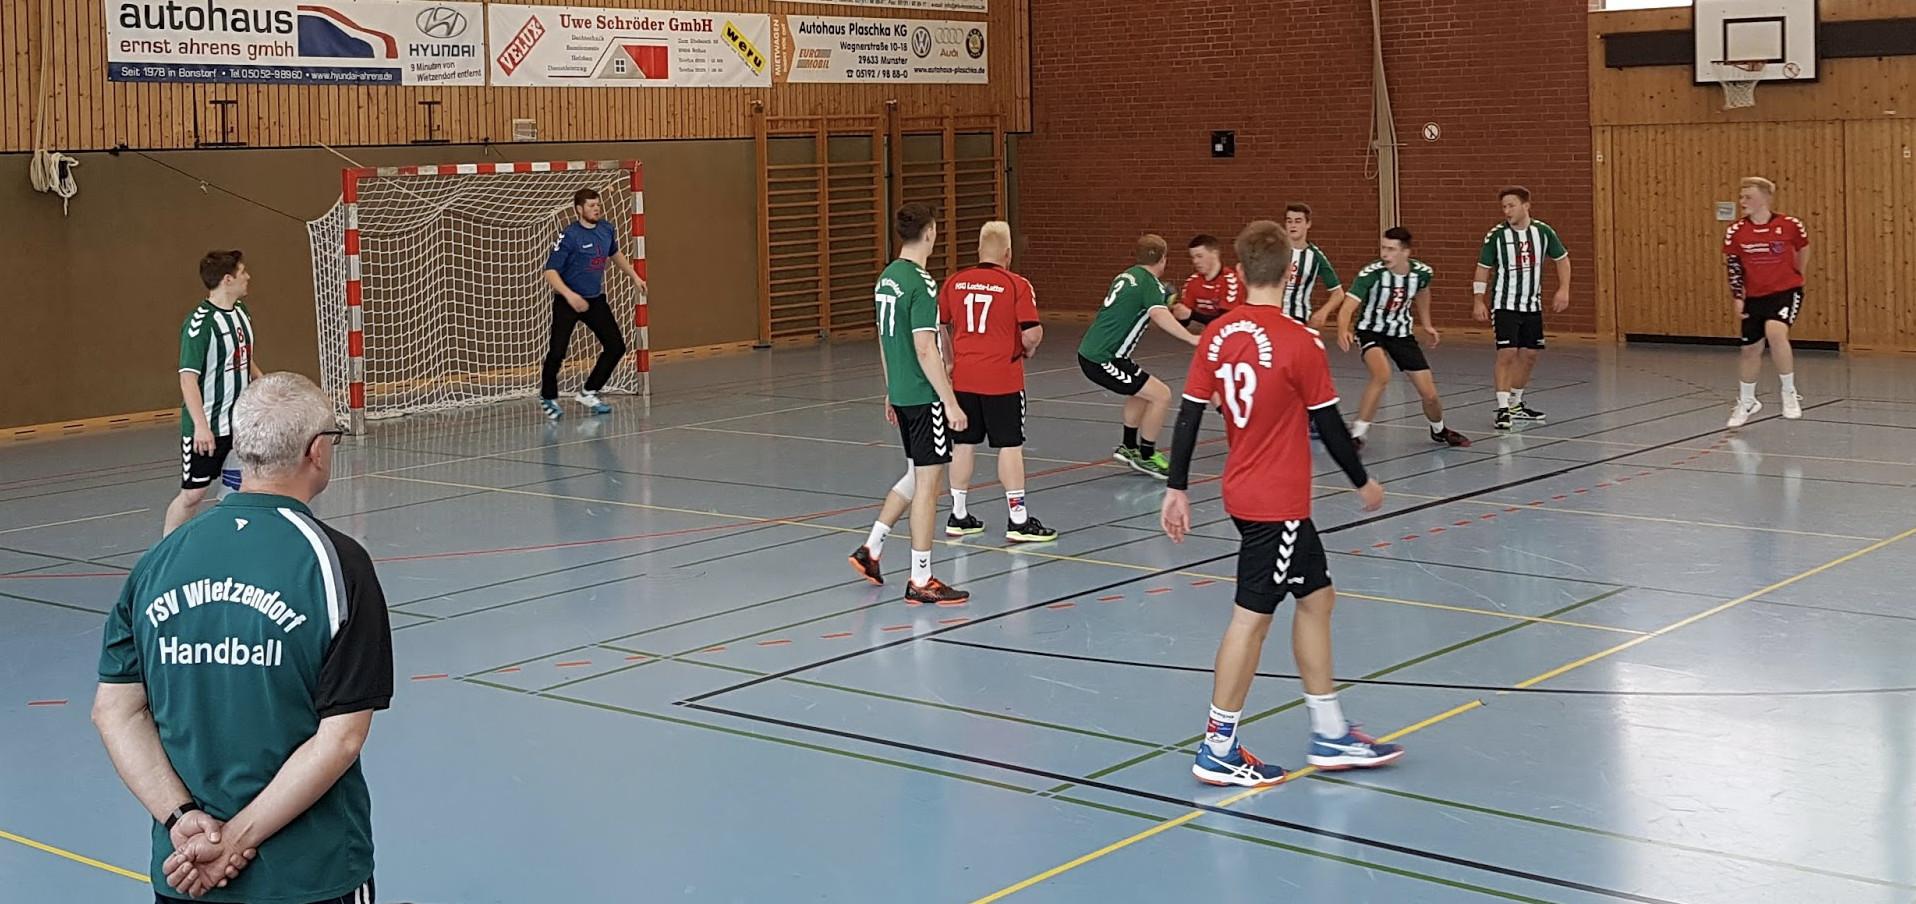 Wietzendorf Handball